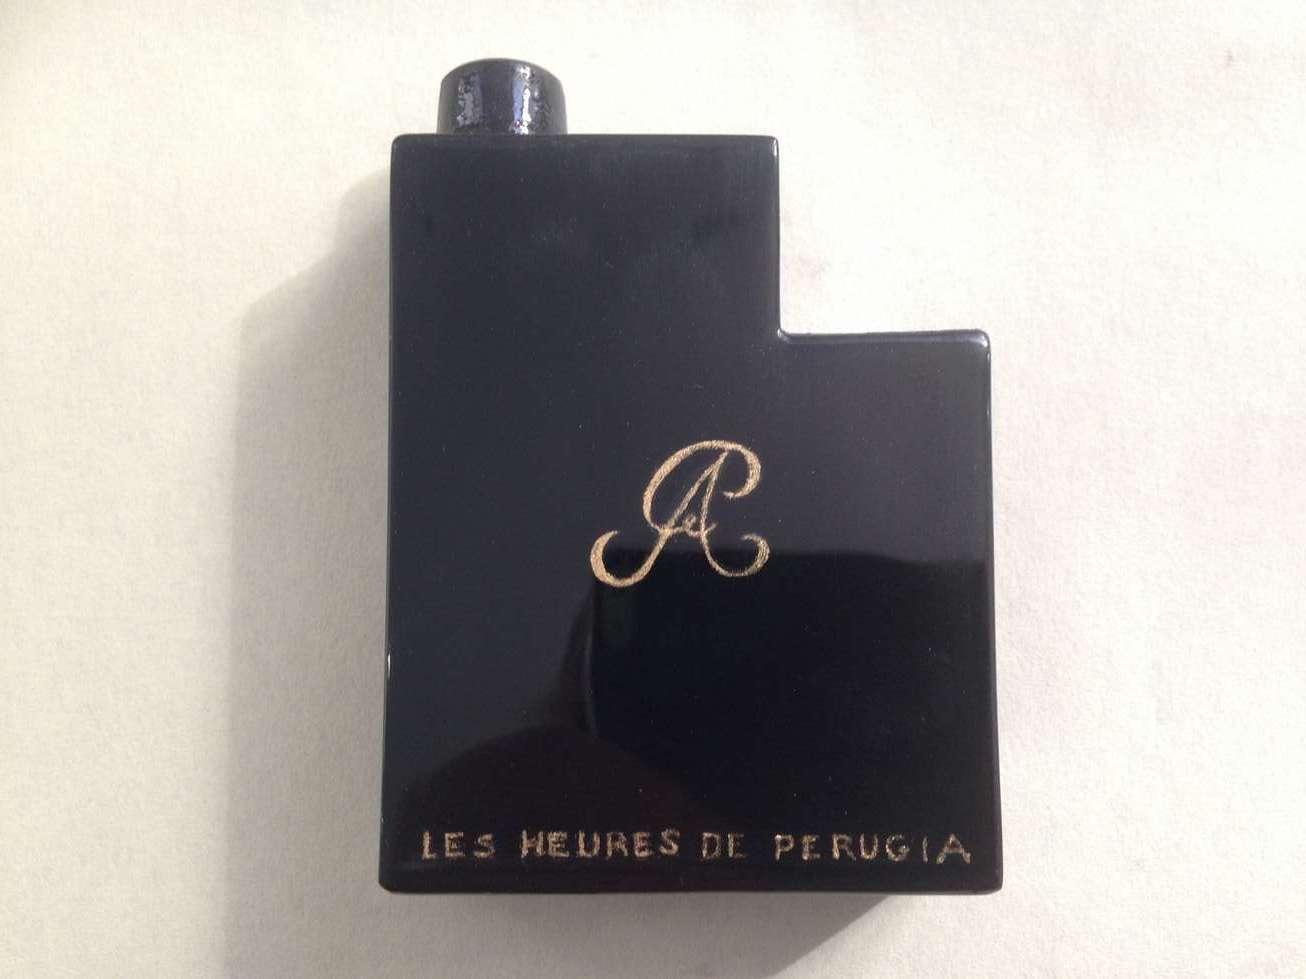 pate-verre-flacon-parfum-heure-perugia-noir-dorure-heures-soir-polissage-polish-art-restauration-reparation-restaurarte.jpg